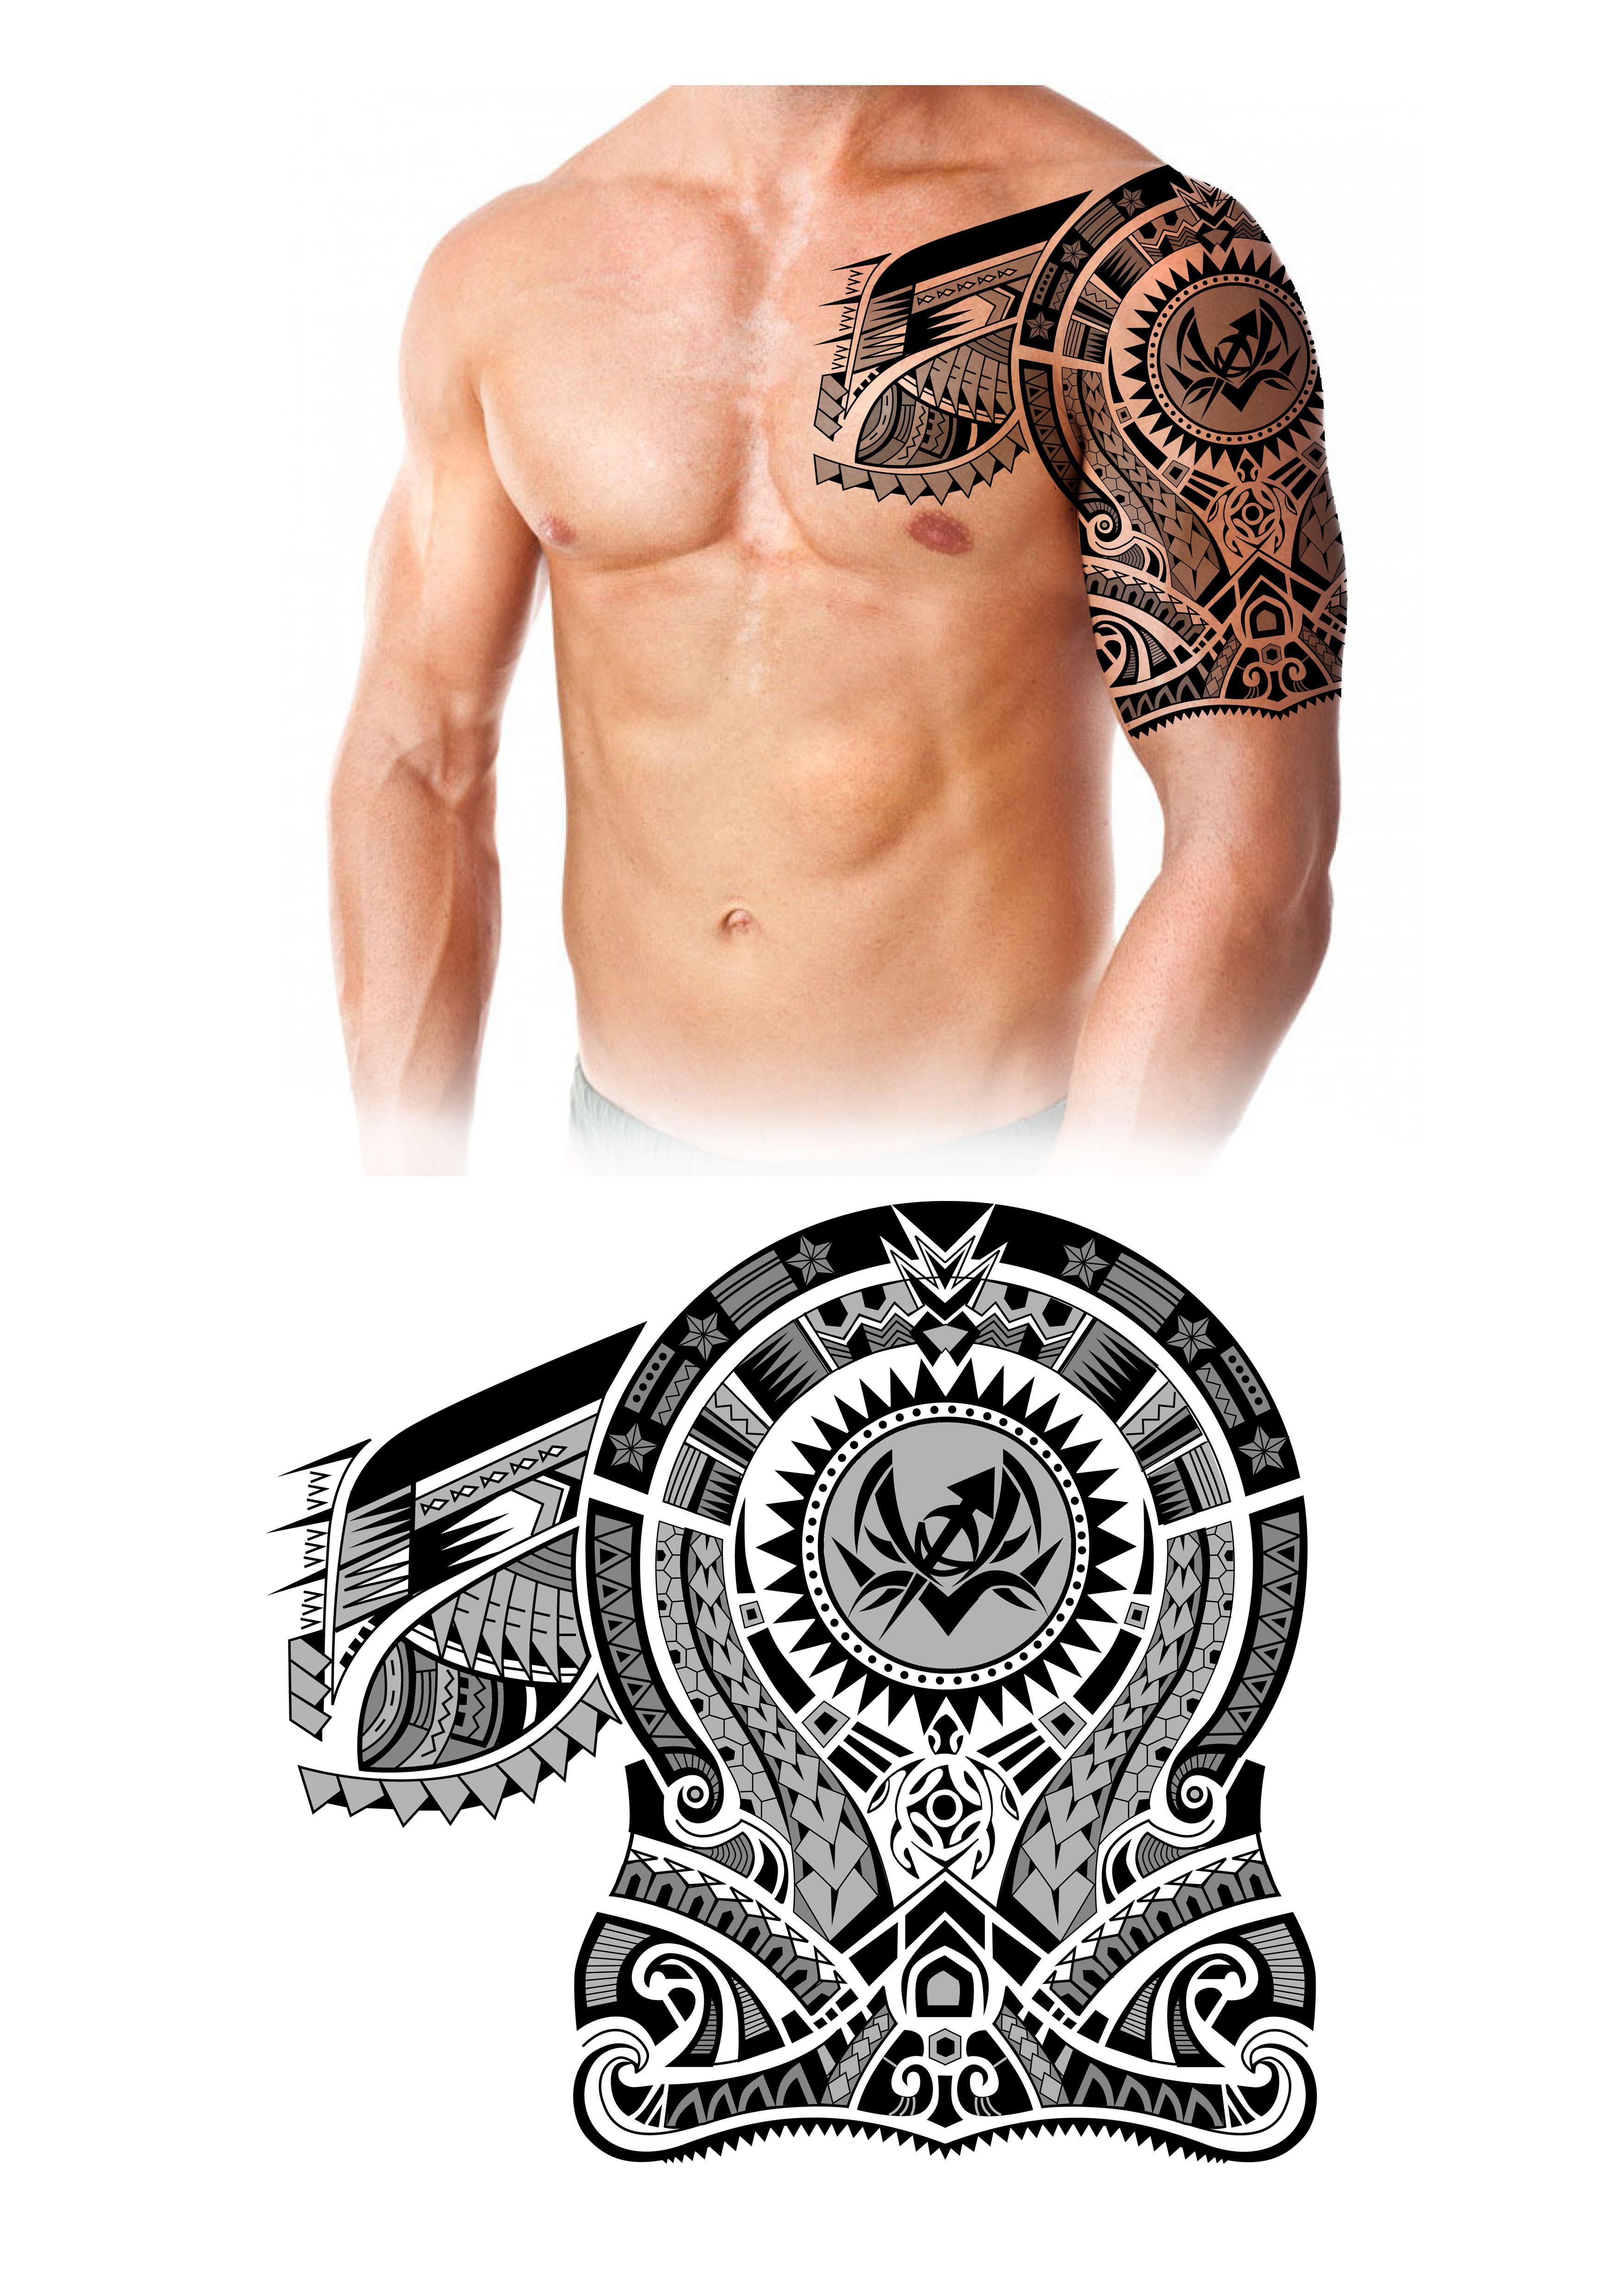 Polynesian Maori Half Sleeve Chest Tattoo Design. Designer